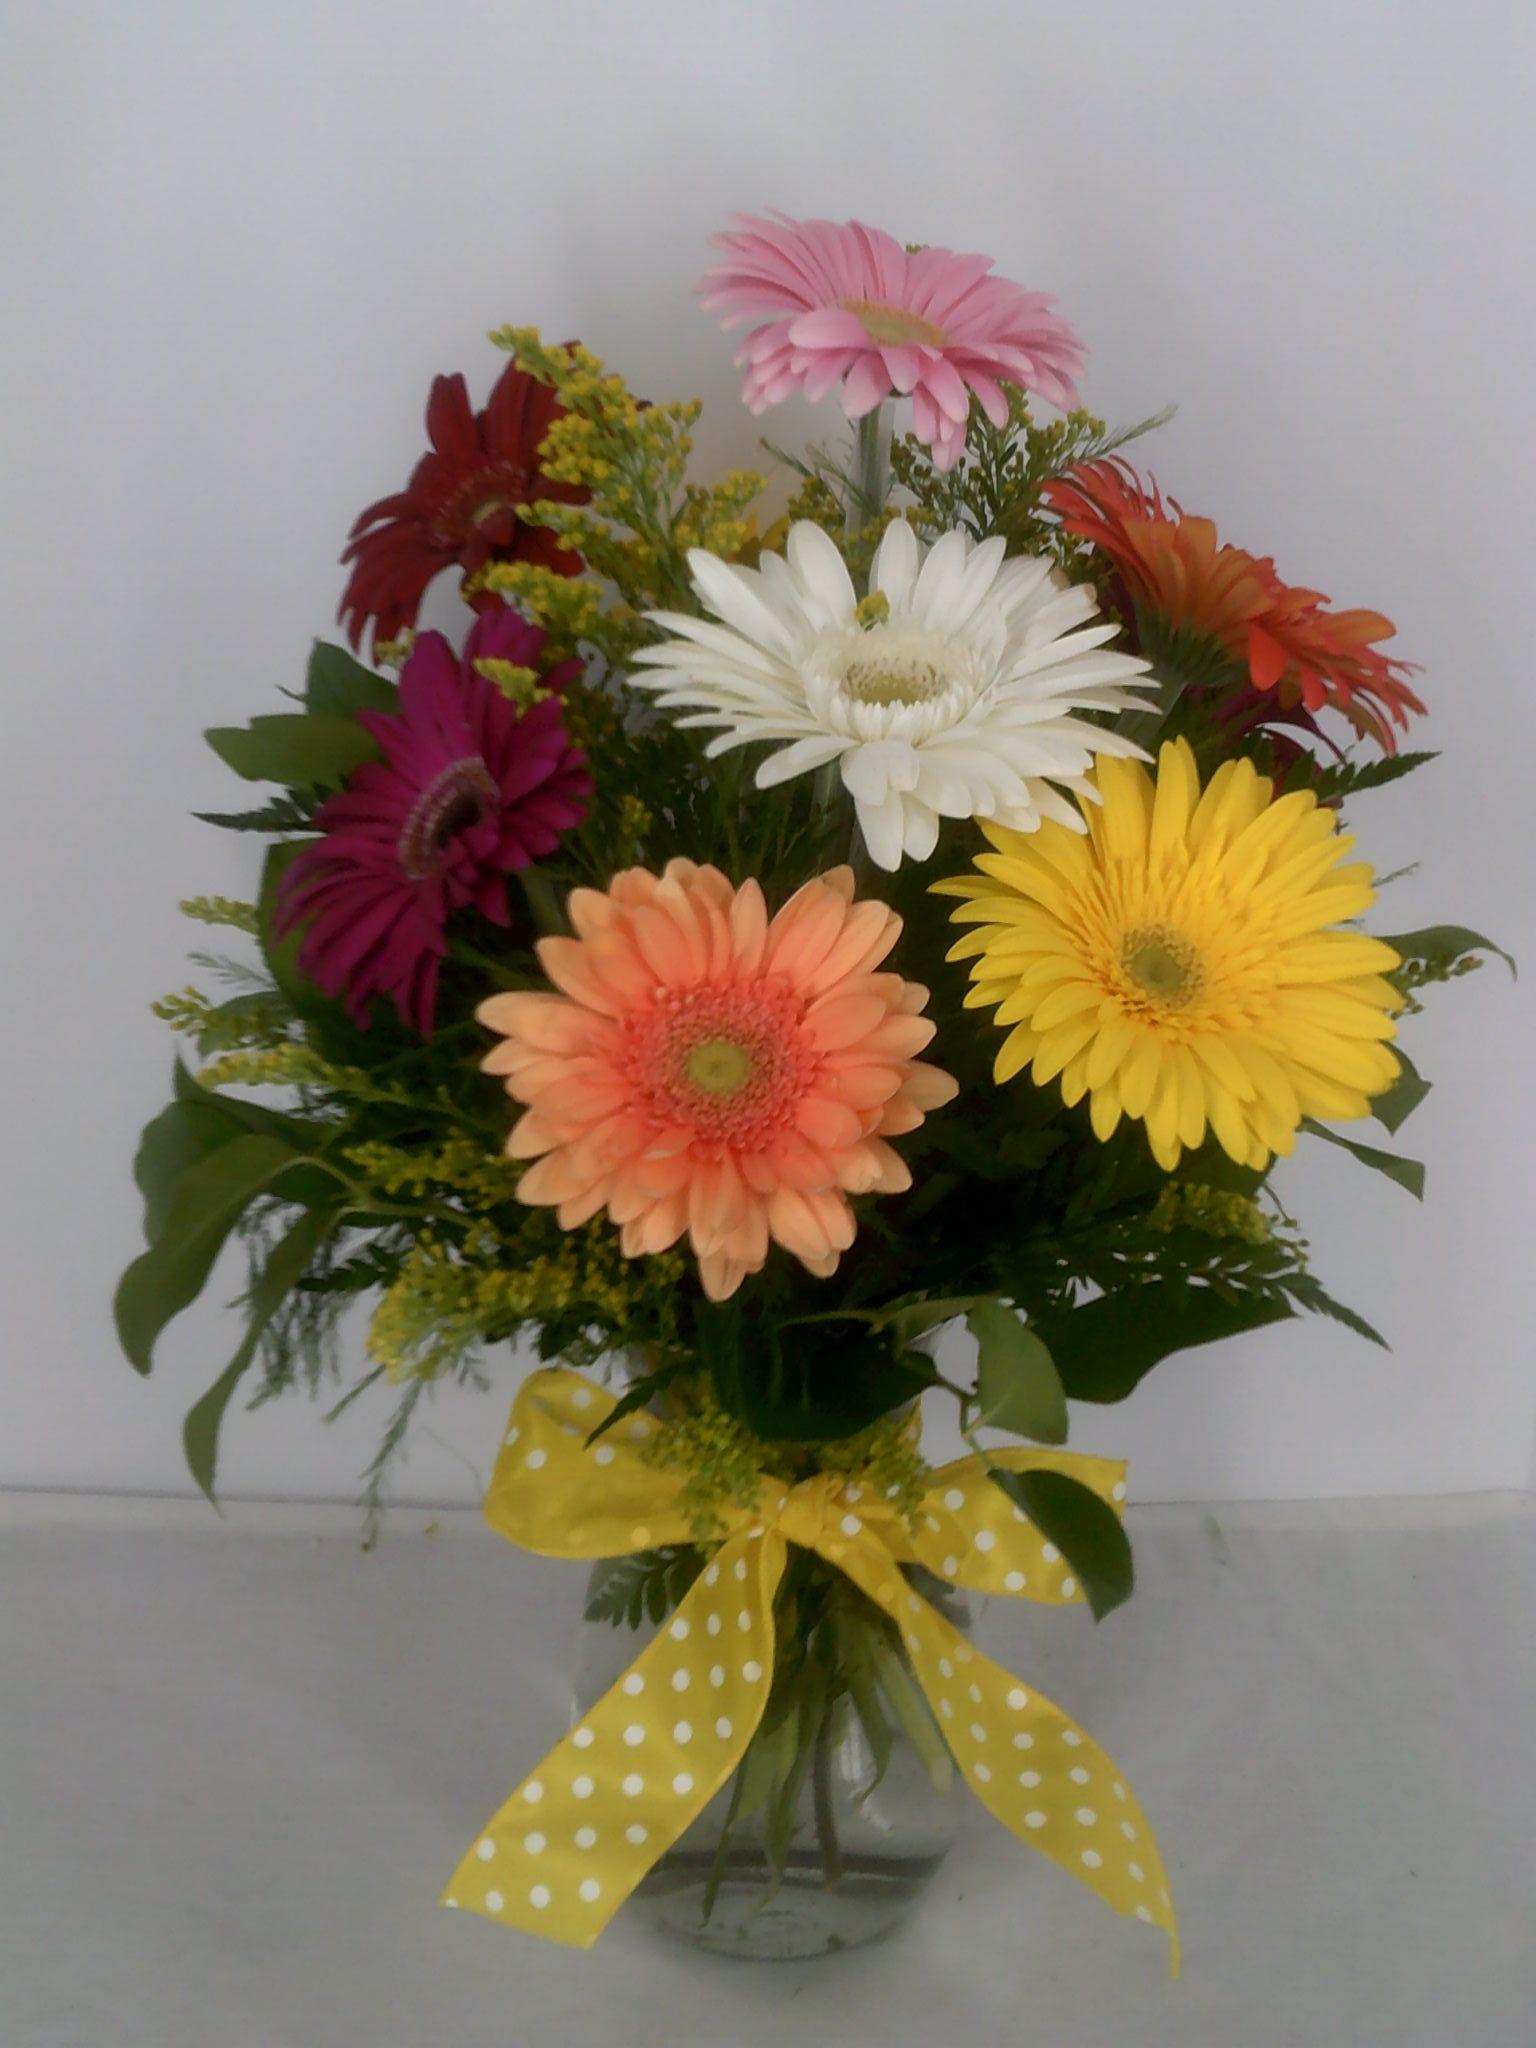 L 70 gerbera love leith flower plant gift shop plaistow nh 03865 izmirmasajfo